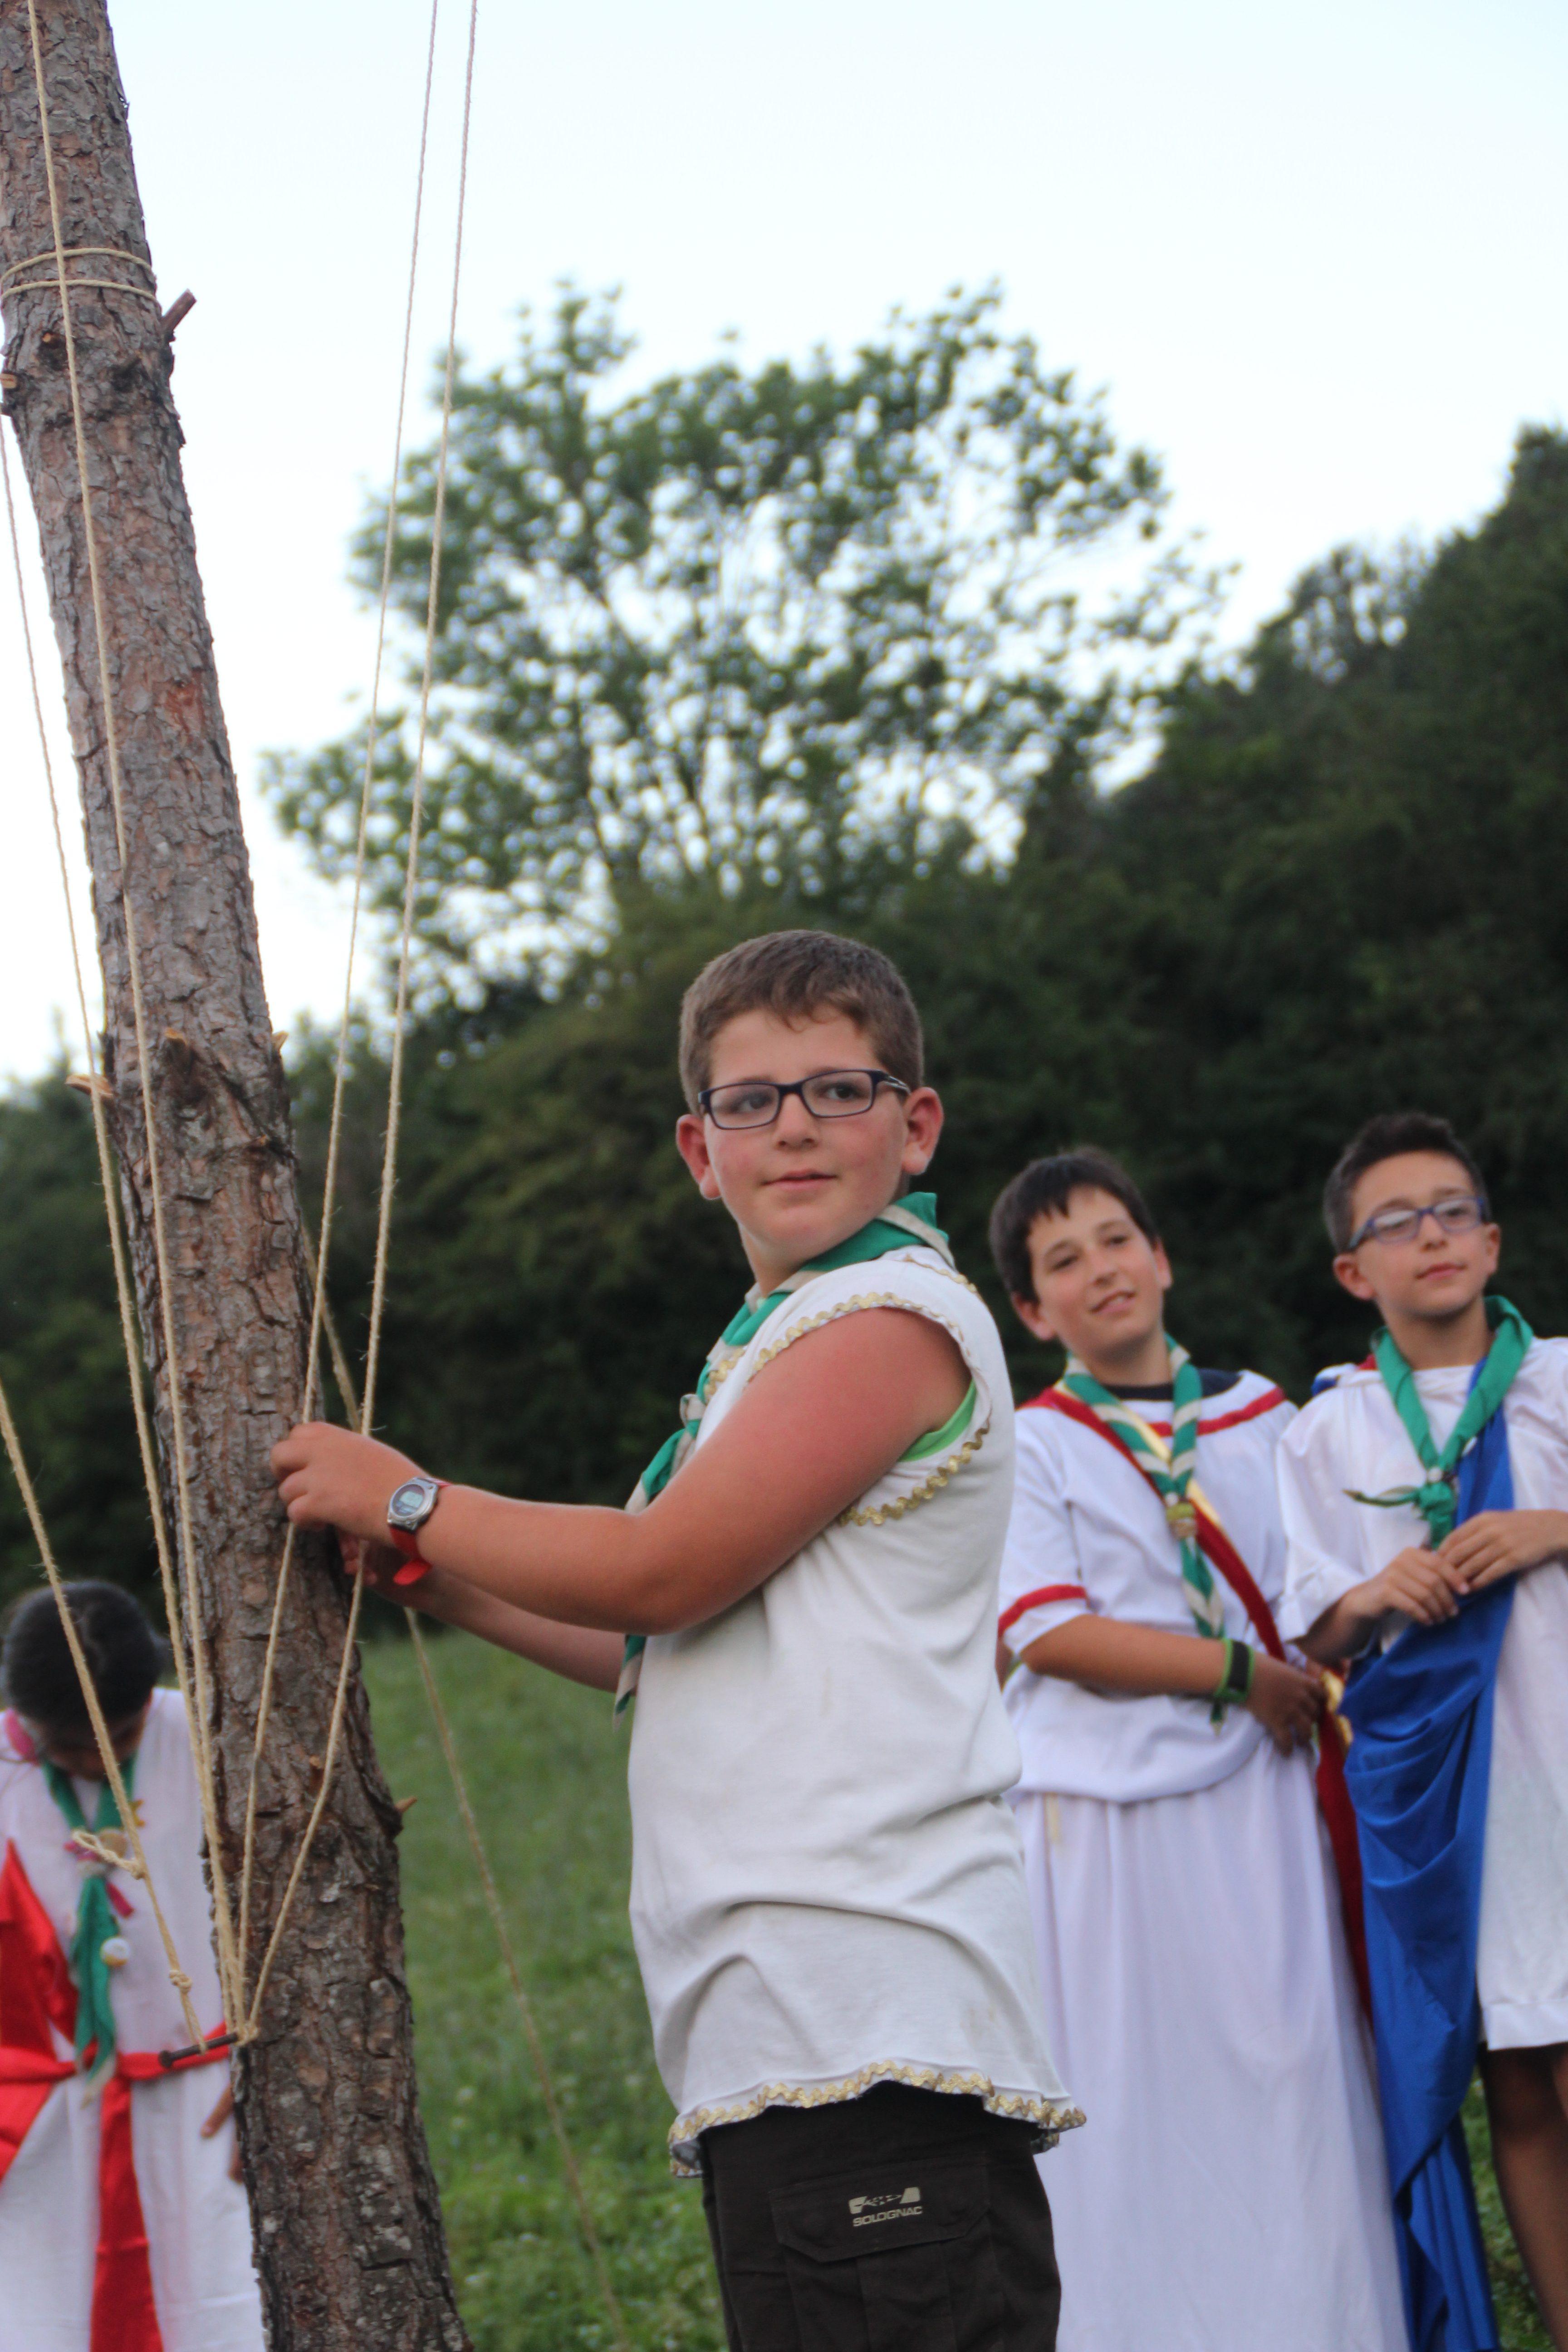 15-16 - Grupo - Campamento de verano - P295